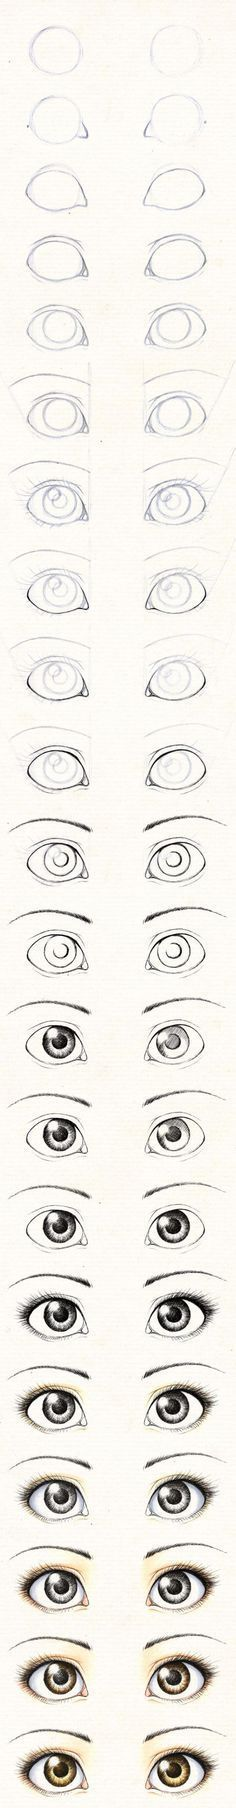 Рисуем глаза текстильной кукле / Tutorial: Draw eyes for textile doll #diy #painting #doll